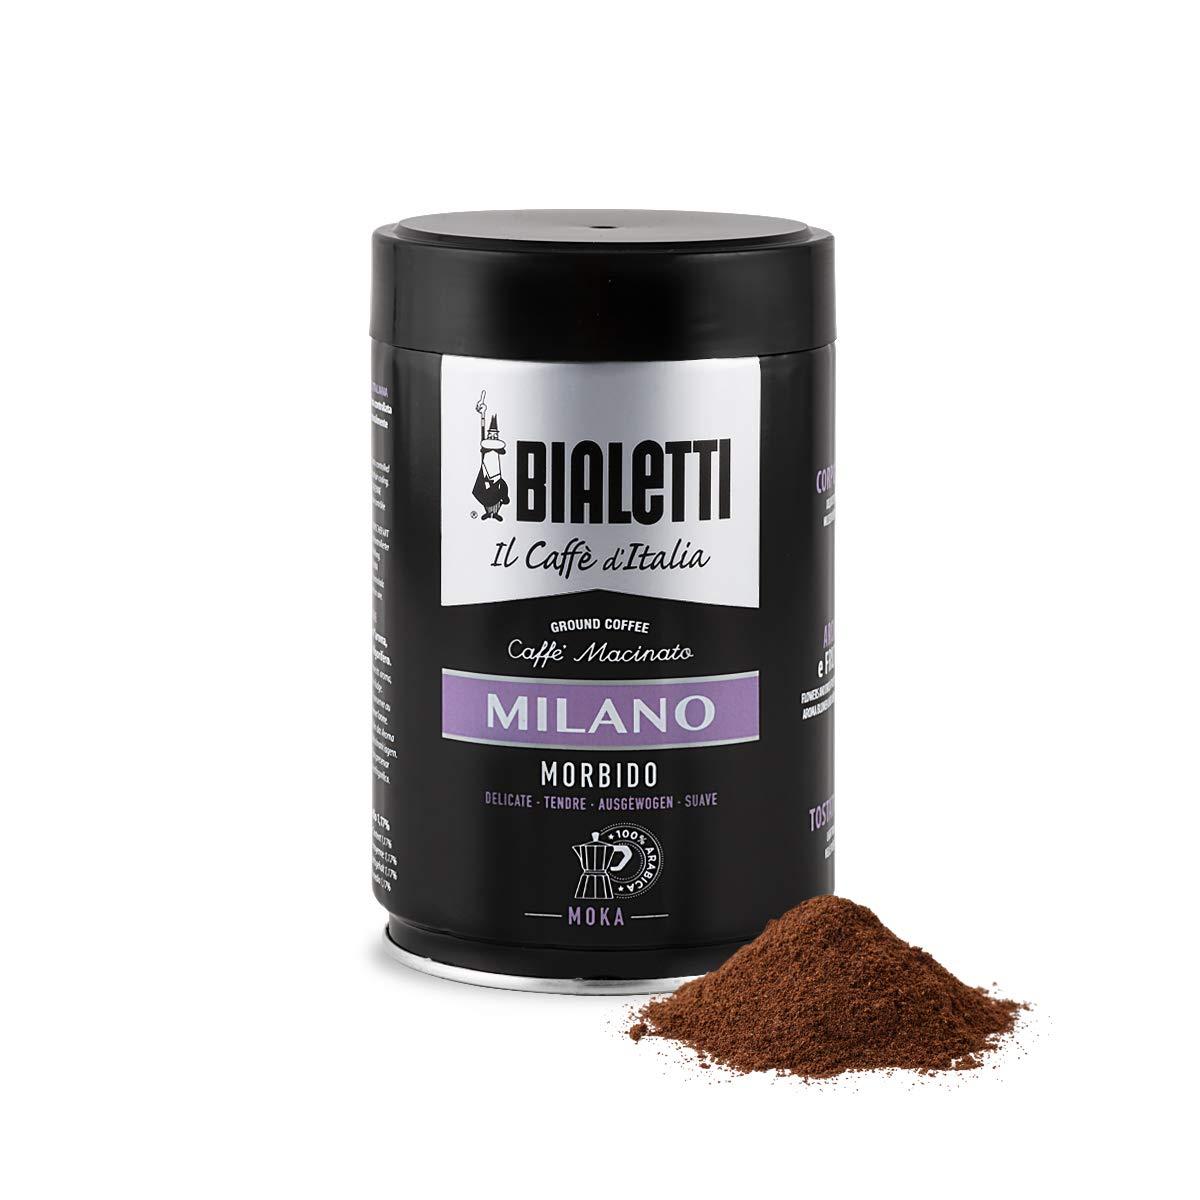 Bialetti Coffee, Moka Ground, Light Roast, Milano, Italy Signature 100% Arabica Blend, Vacuum Sealed 8.8 Ounce Tin Can